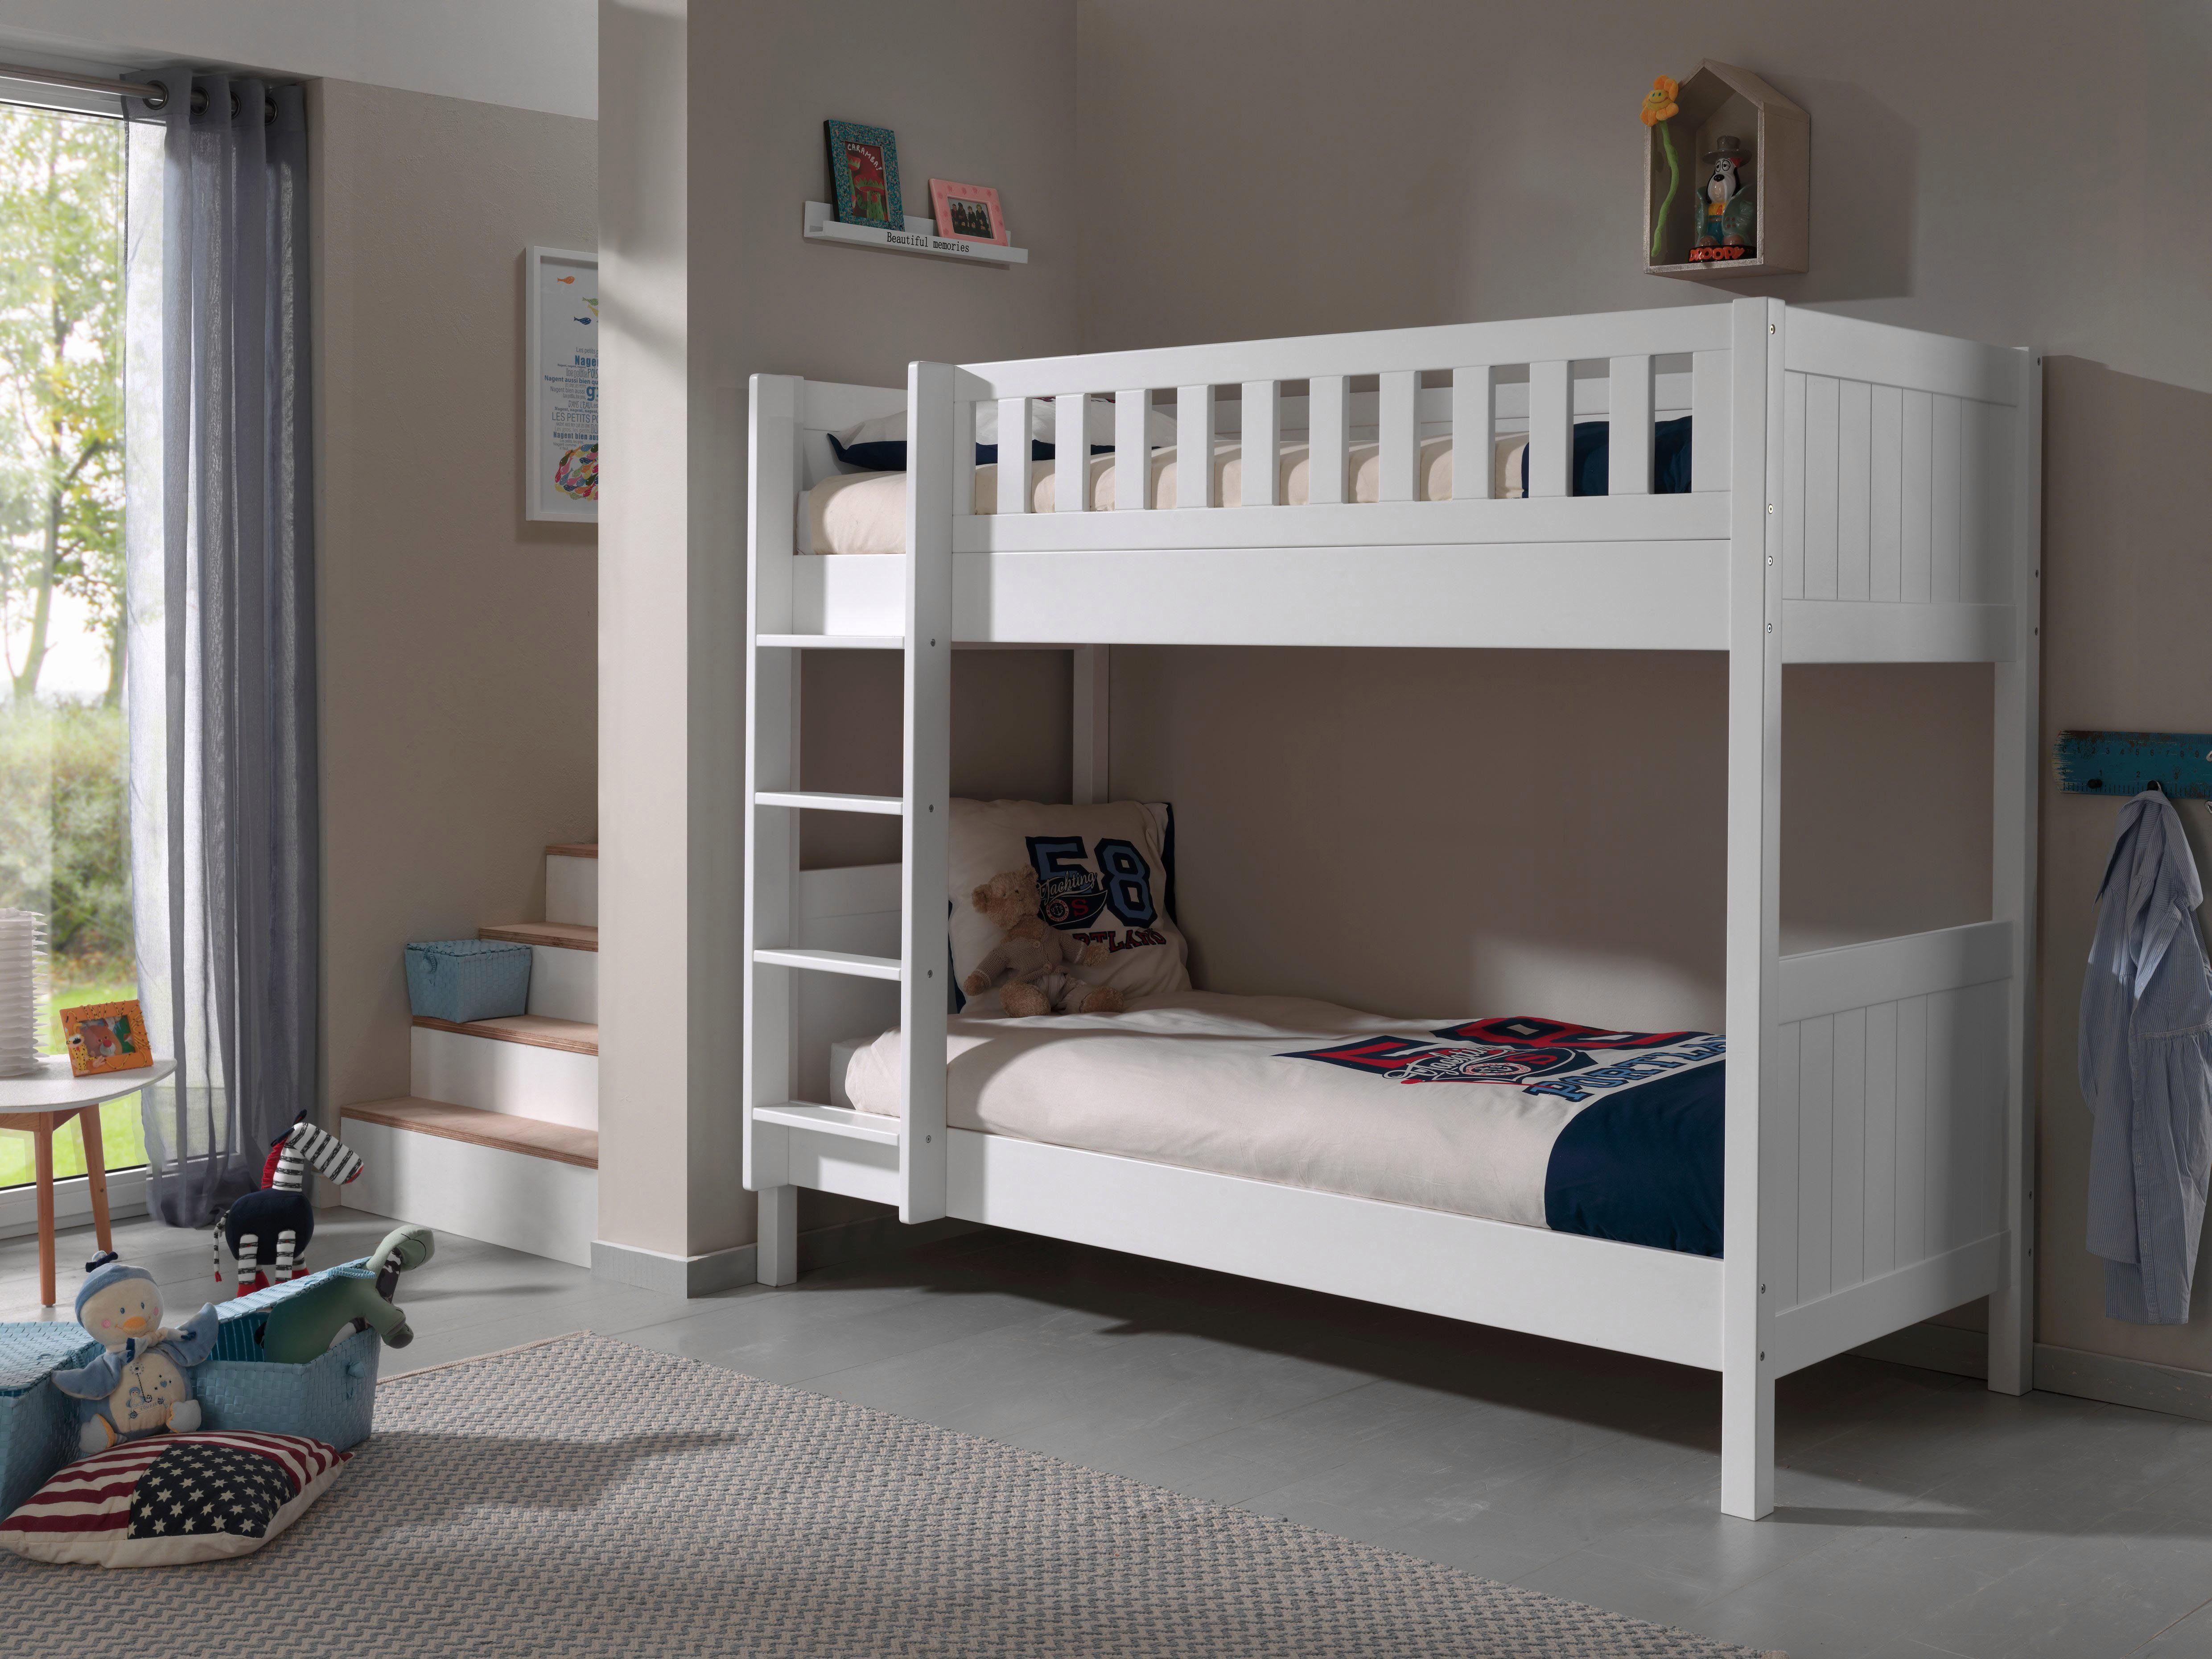 Etagenbett Niedrig : Kinderbett niedrig u sehr schön etagenbett stian cm